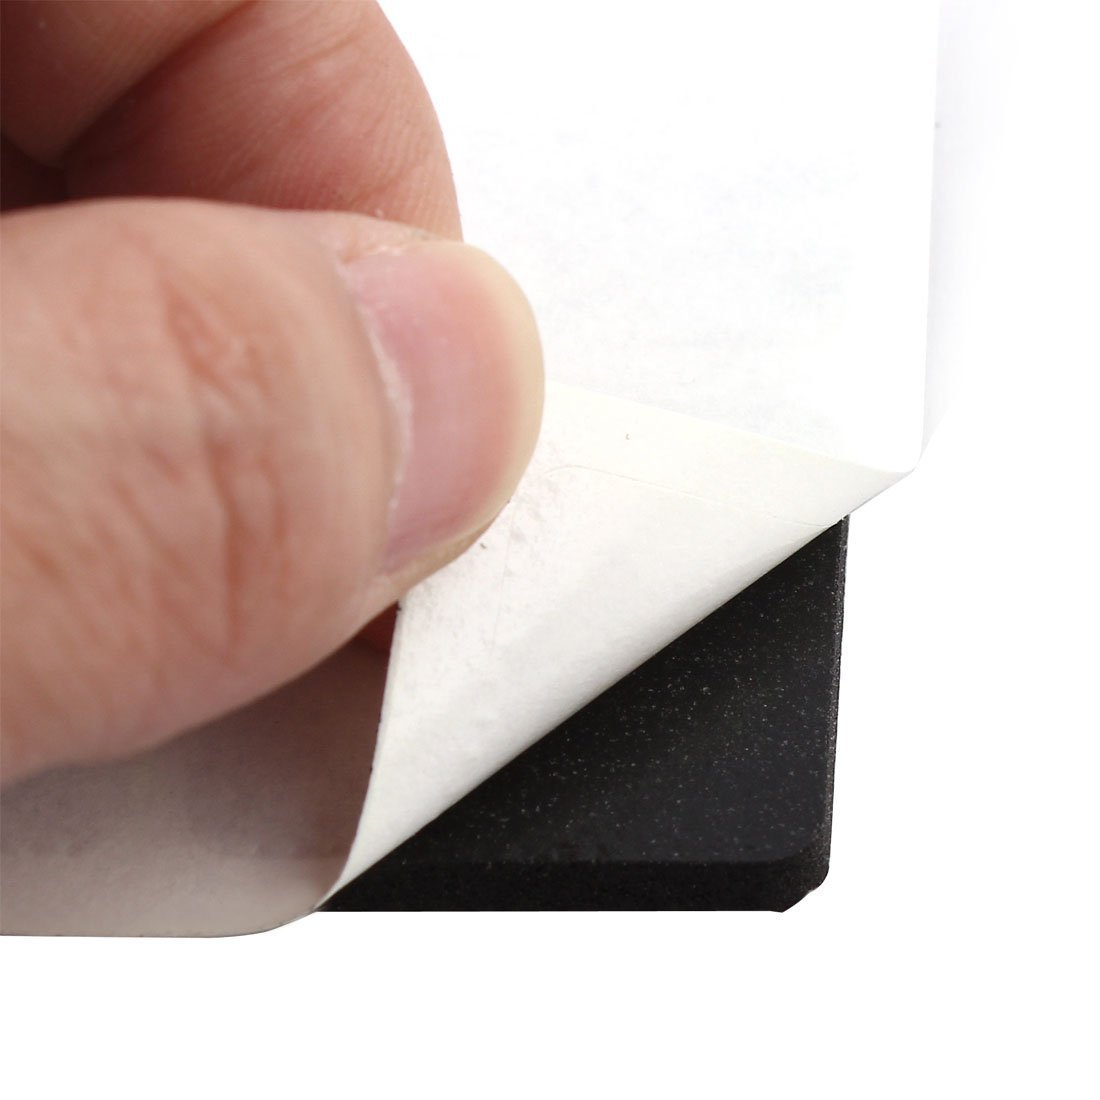 Sourcingmap/® Tabla de Goma rect/ángulo Cero contra la Pierna rellena el Protector Negro 30mm x 30mm 12pcs